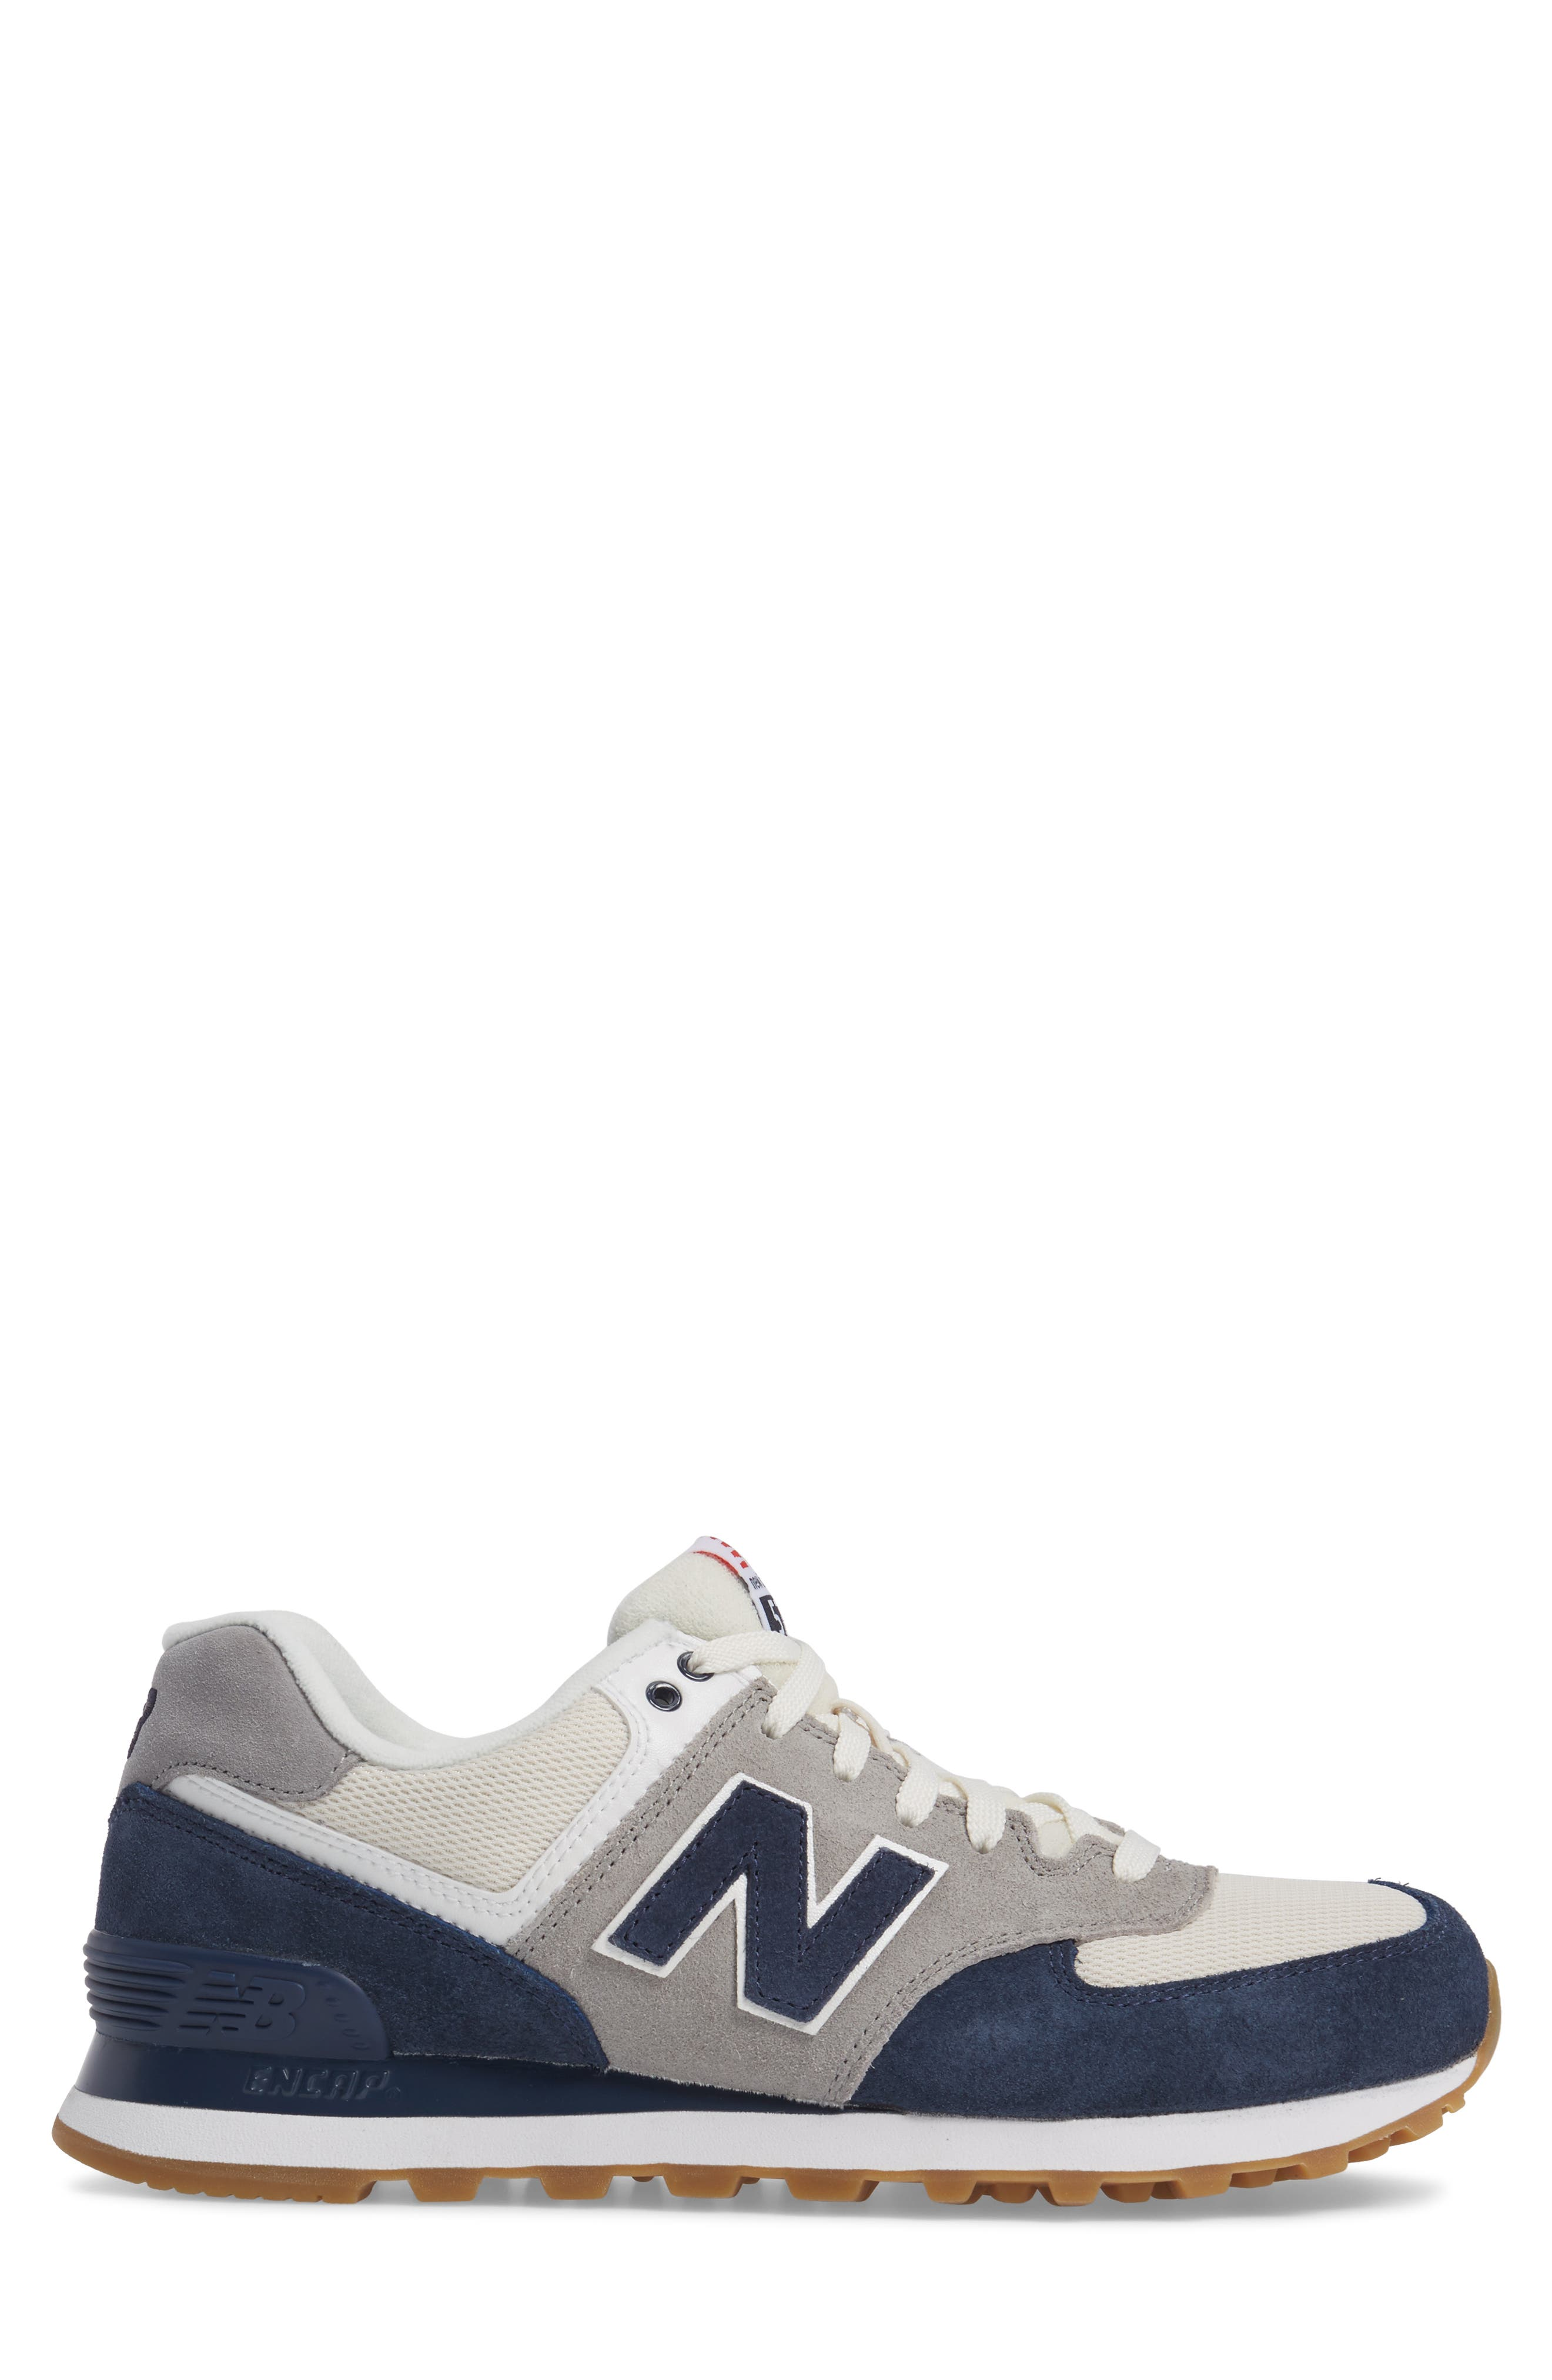 574 Retro Sport Sneaker,                             Alternate thumbnail 3, color,                             Electric Blue